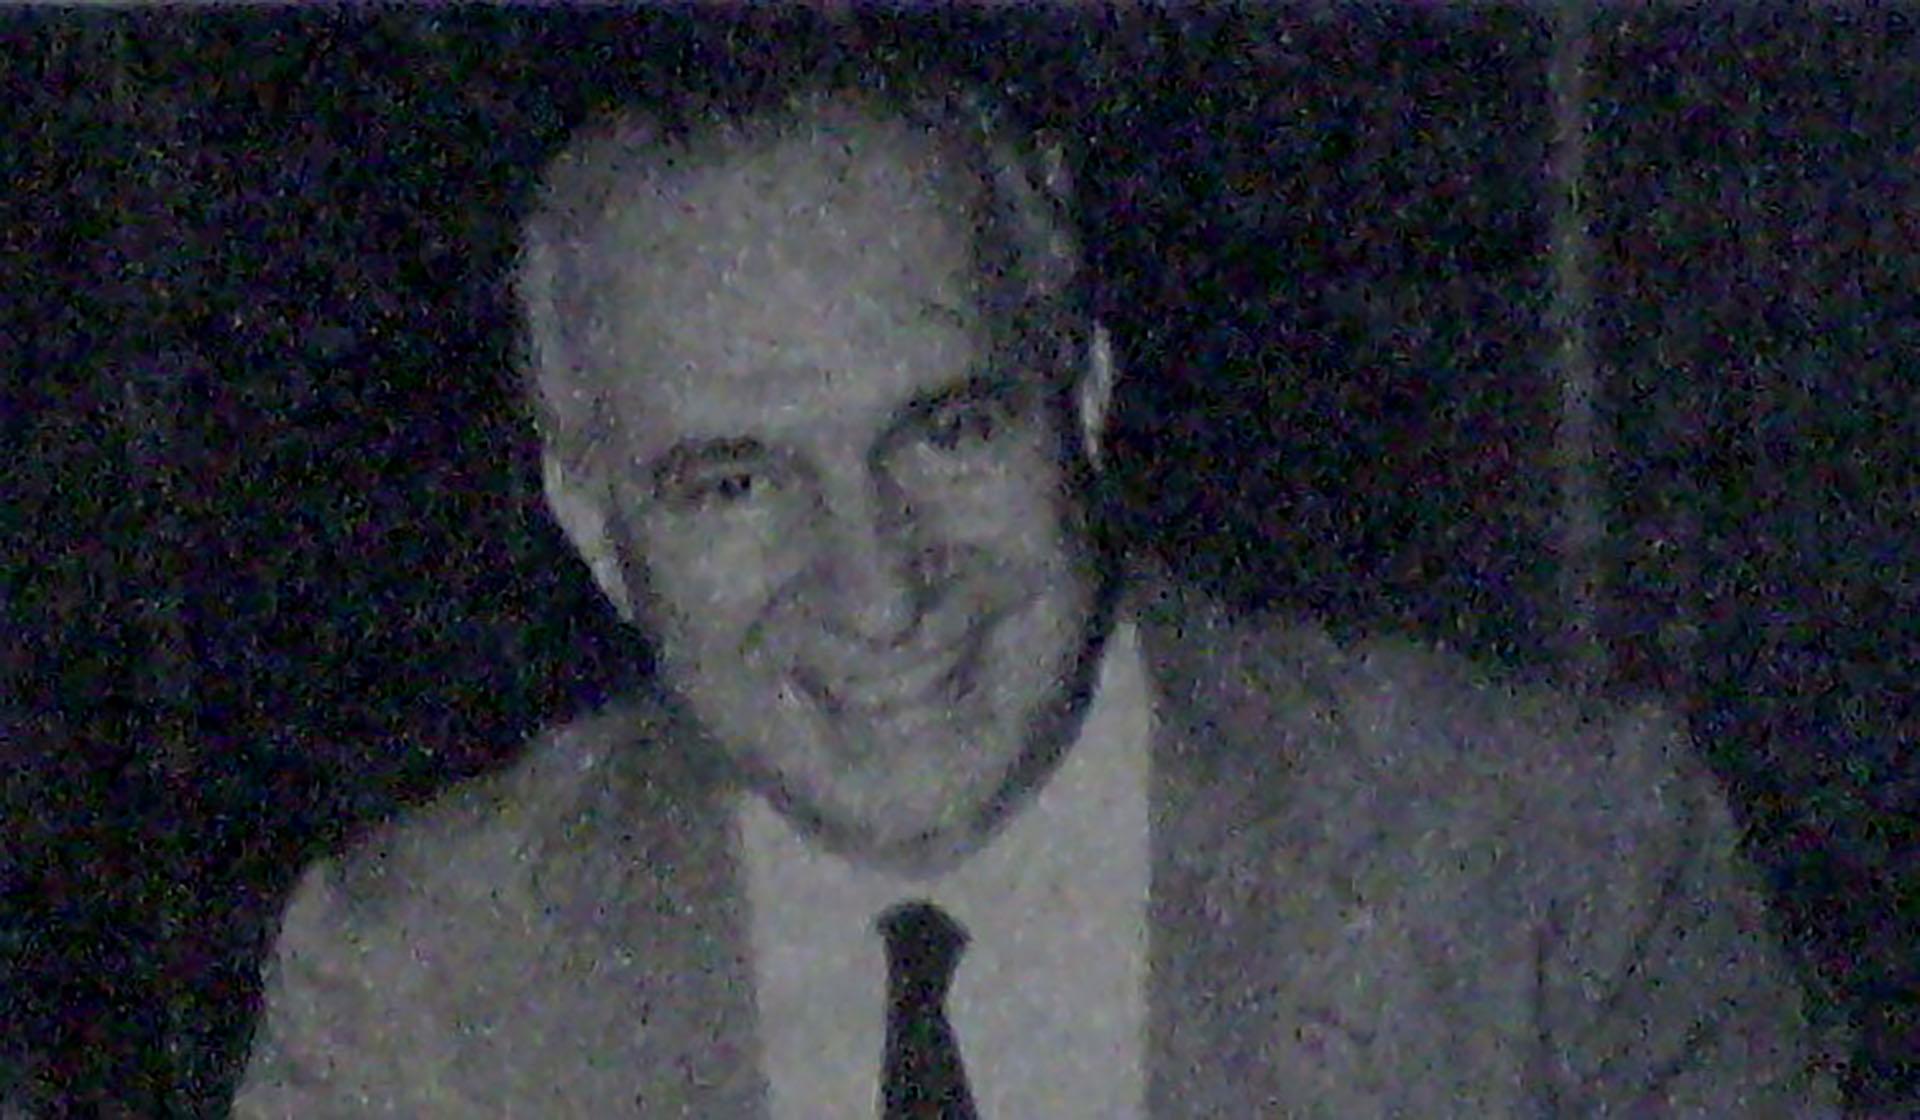 Carlos Humberto Perette